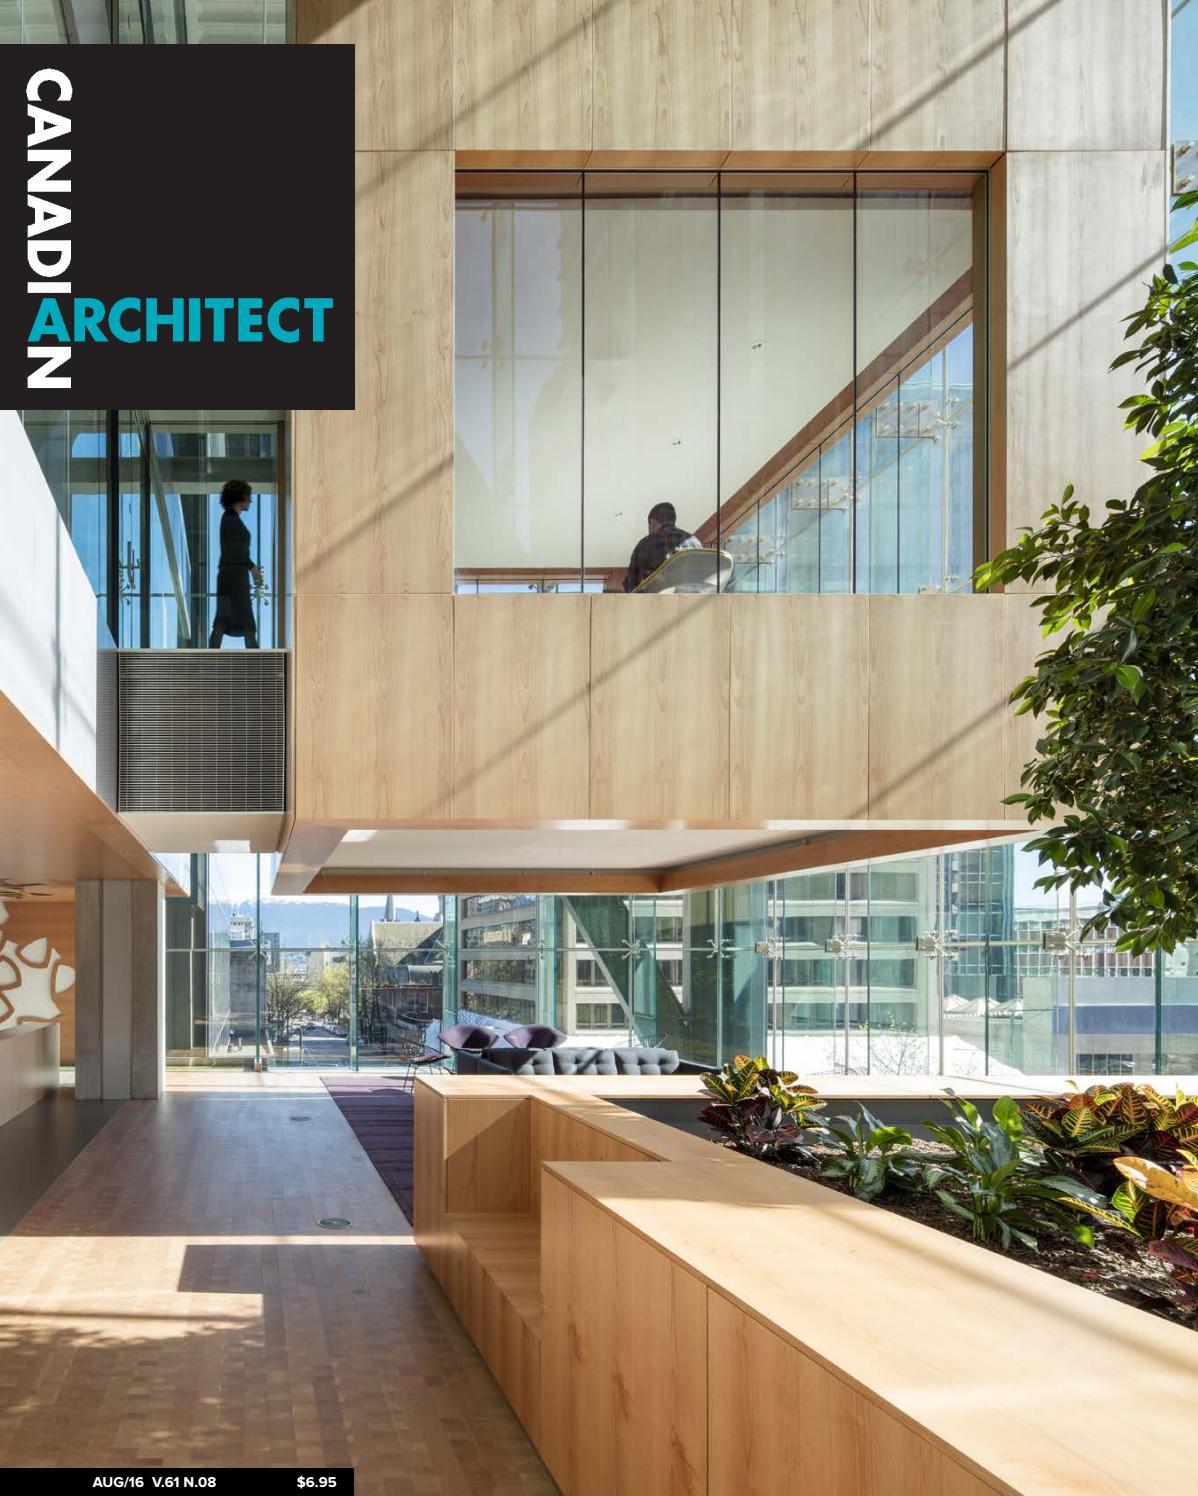 Construction Hangar Bois Prix canadian architect august 2016iq business media - issuu